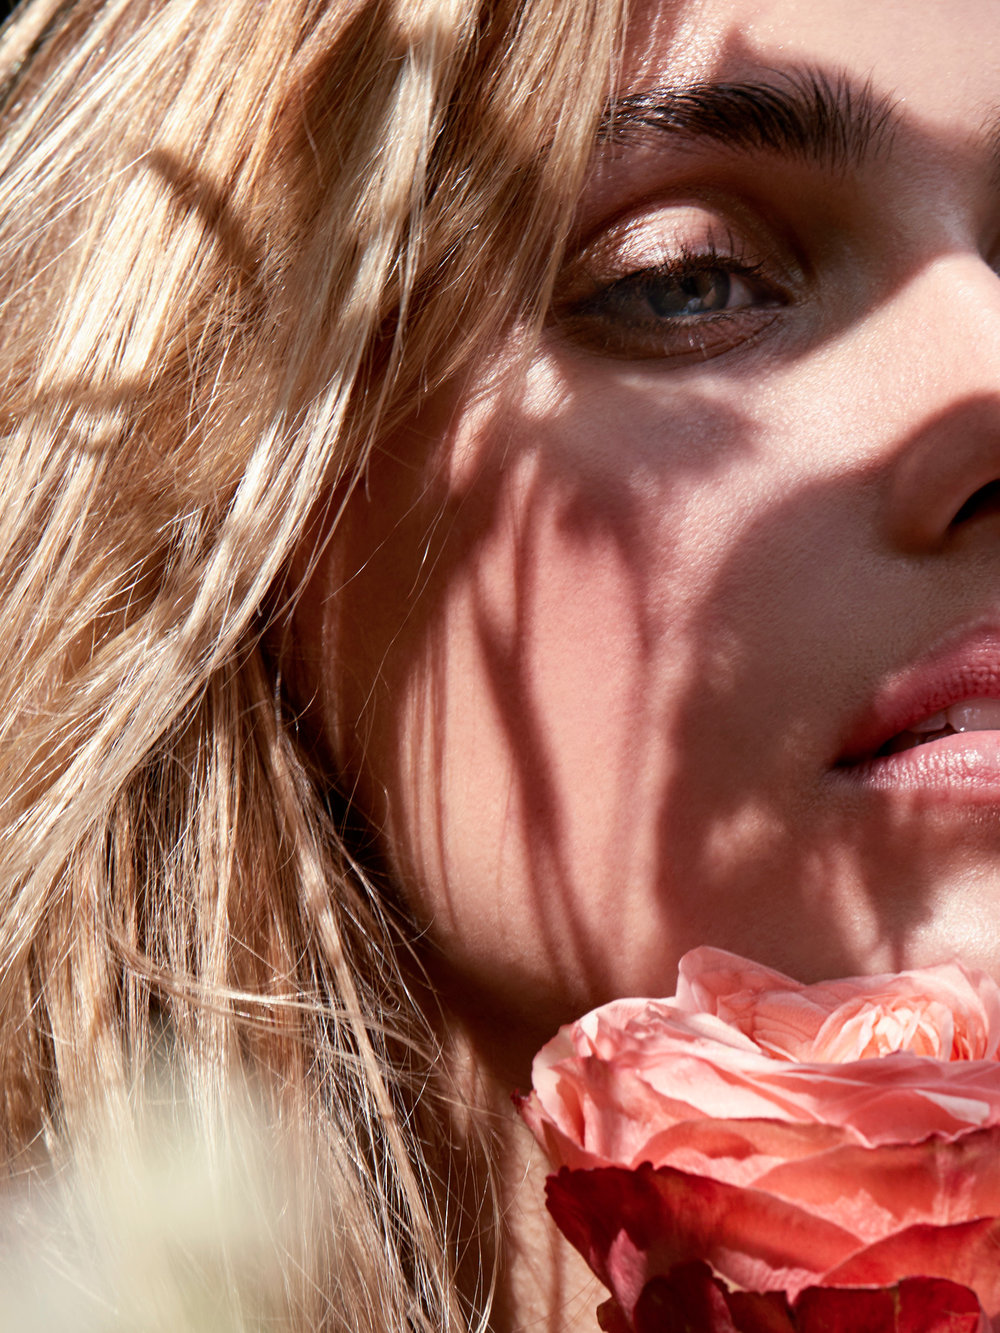 Lips:  Ilia Perfect Day lipstick  Cheeks: Elate Clean Cosmetics Powder Blush in Titian